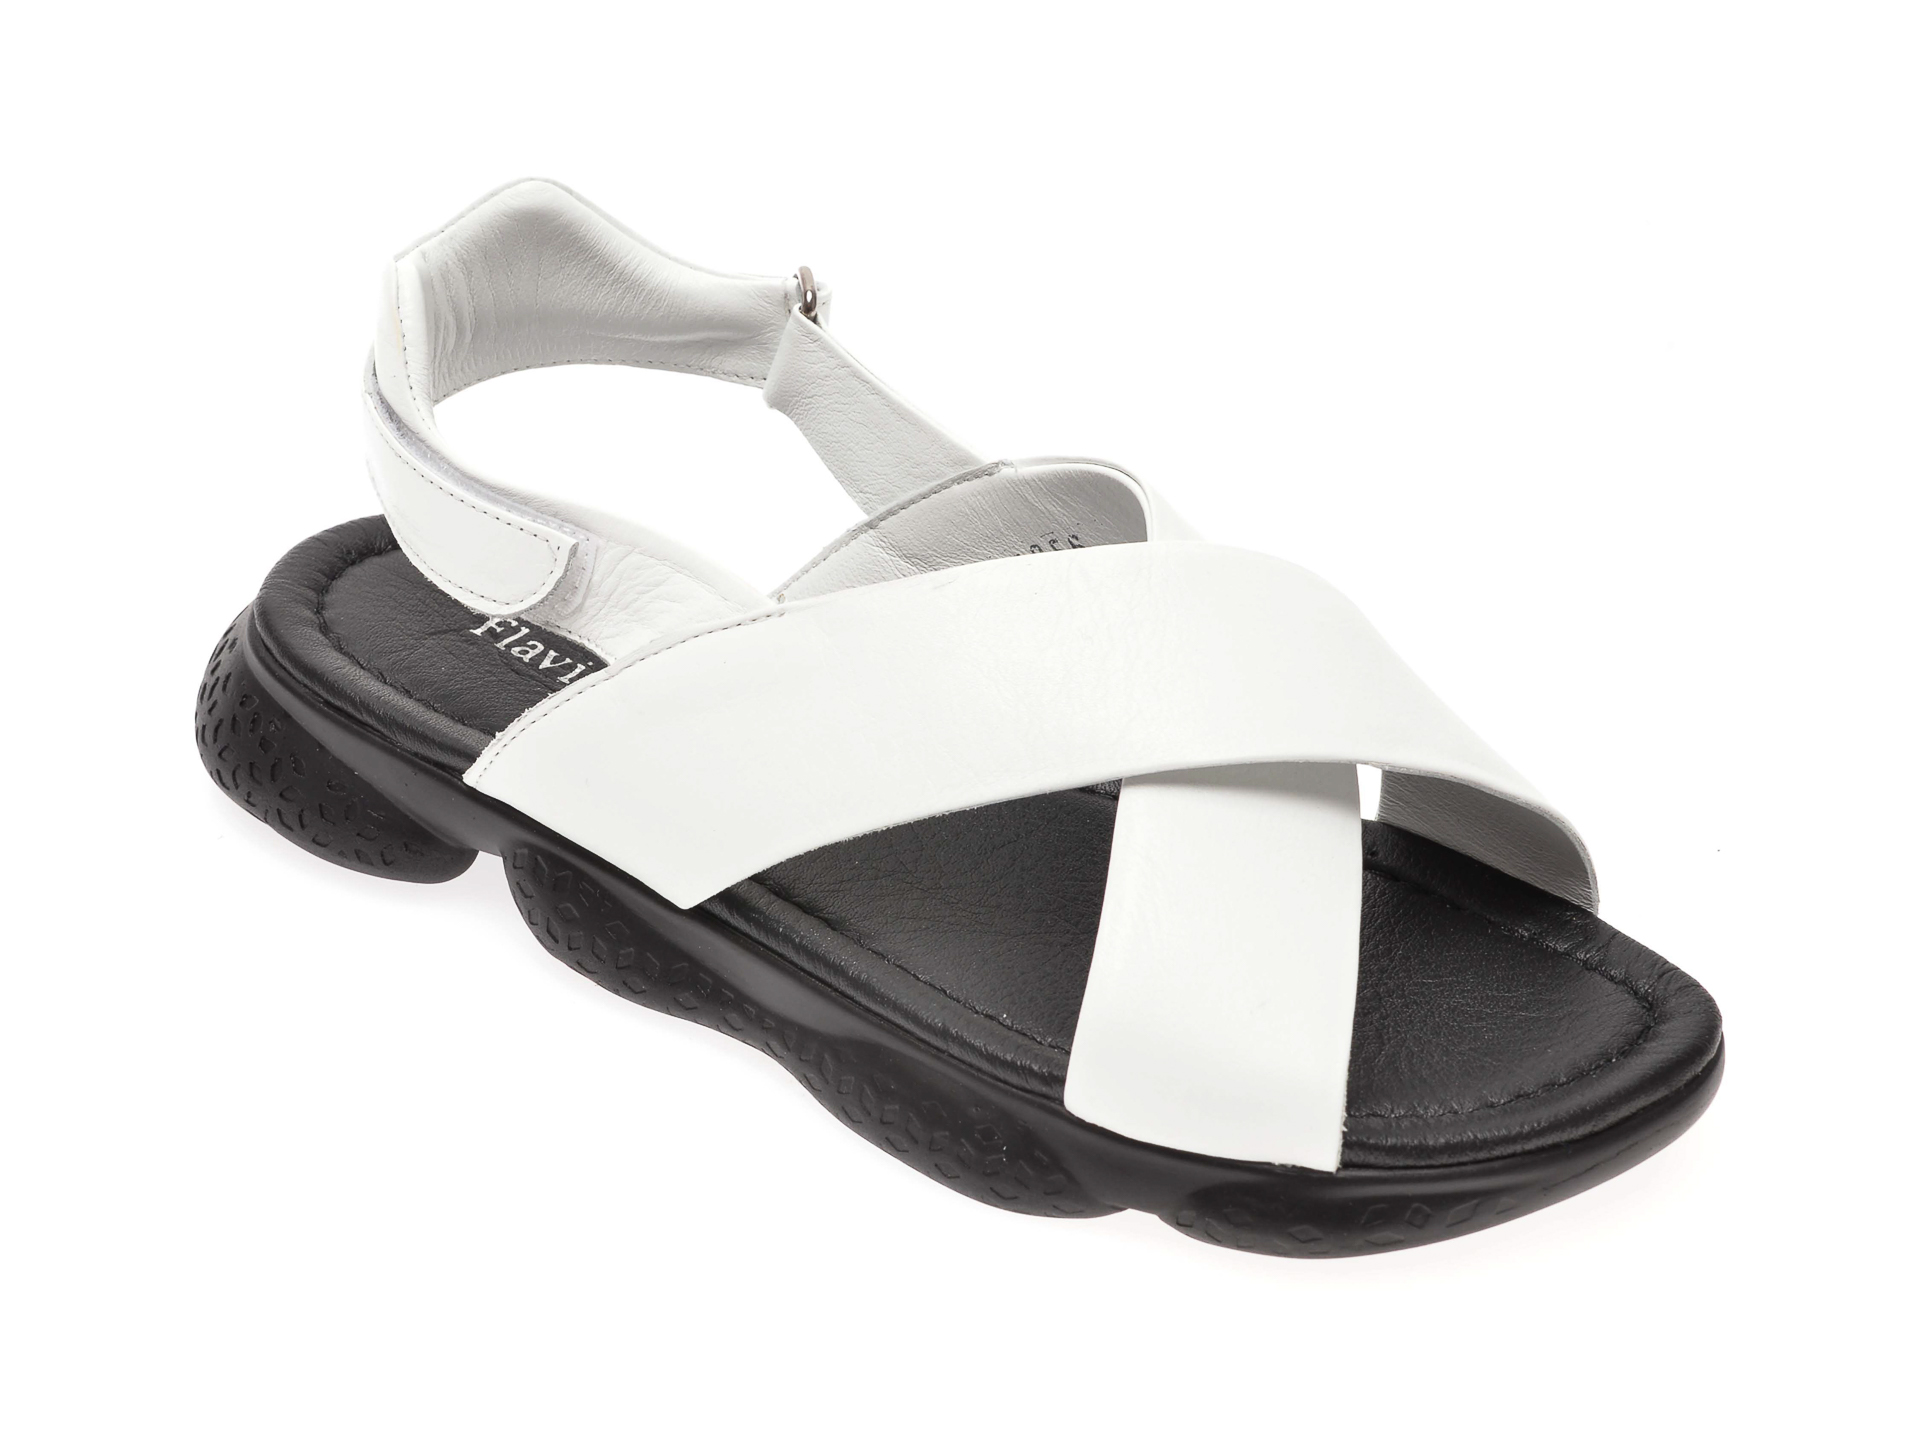 Sandale FLAVIA PASSINI albe, 8285856, din piele naturala